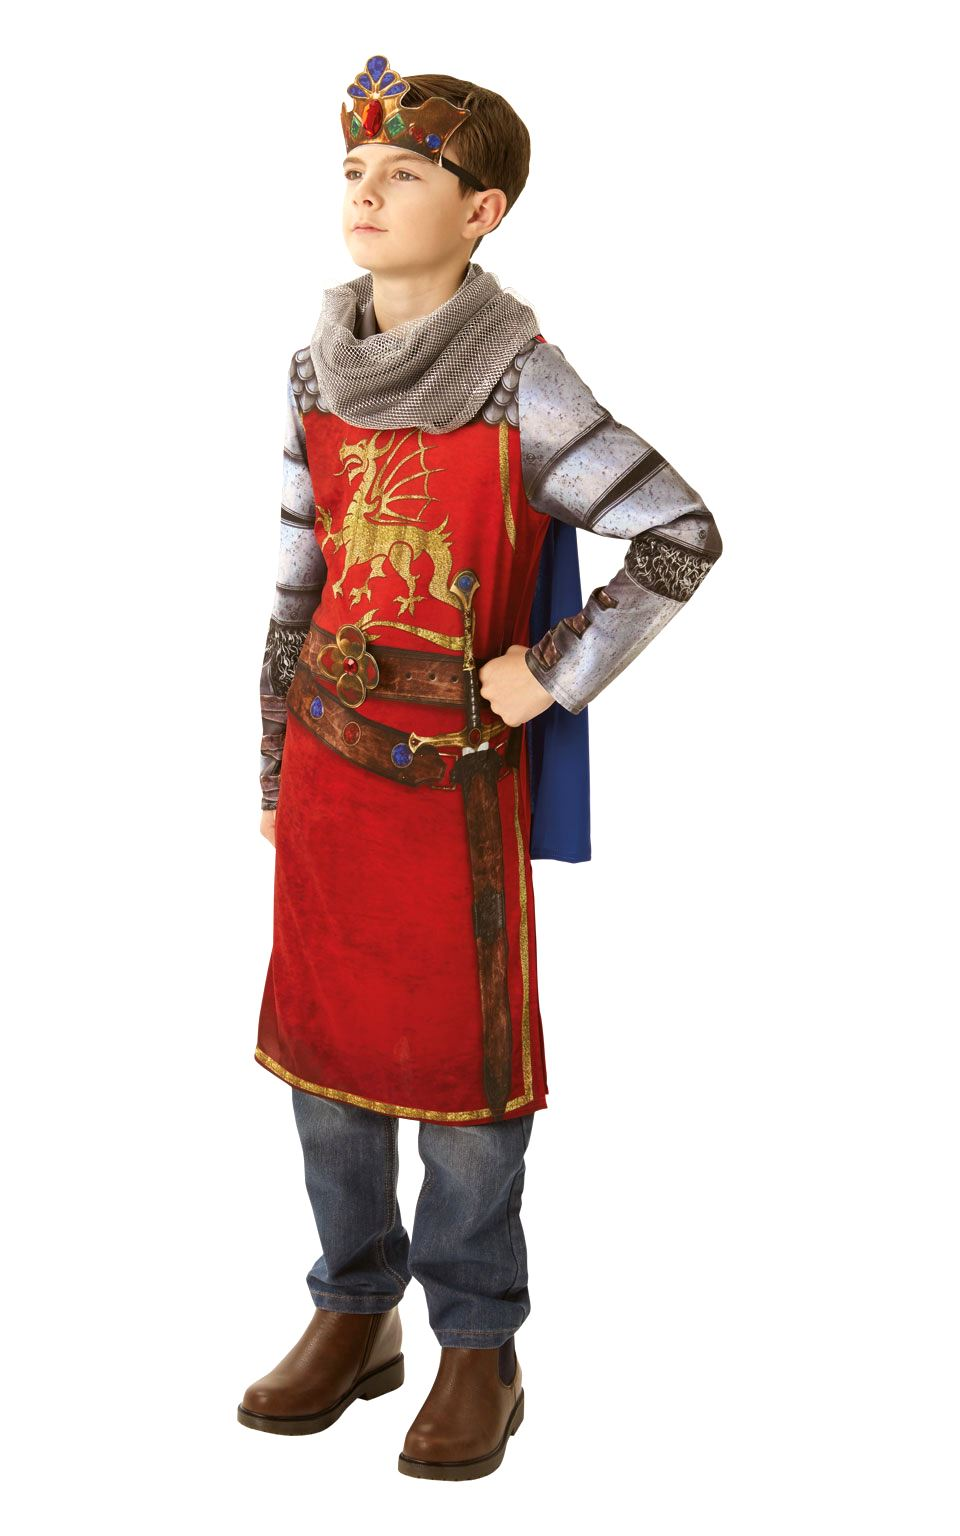 Boys-Deluxe-King-Arthur-Costume-Medieval-Prince-Child-  sc 1 st  eBay & Boys Deluxe King Arthur Costume Medieval Prince Child Fancy Dress ...